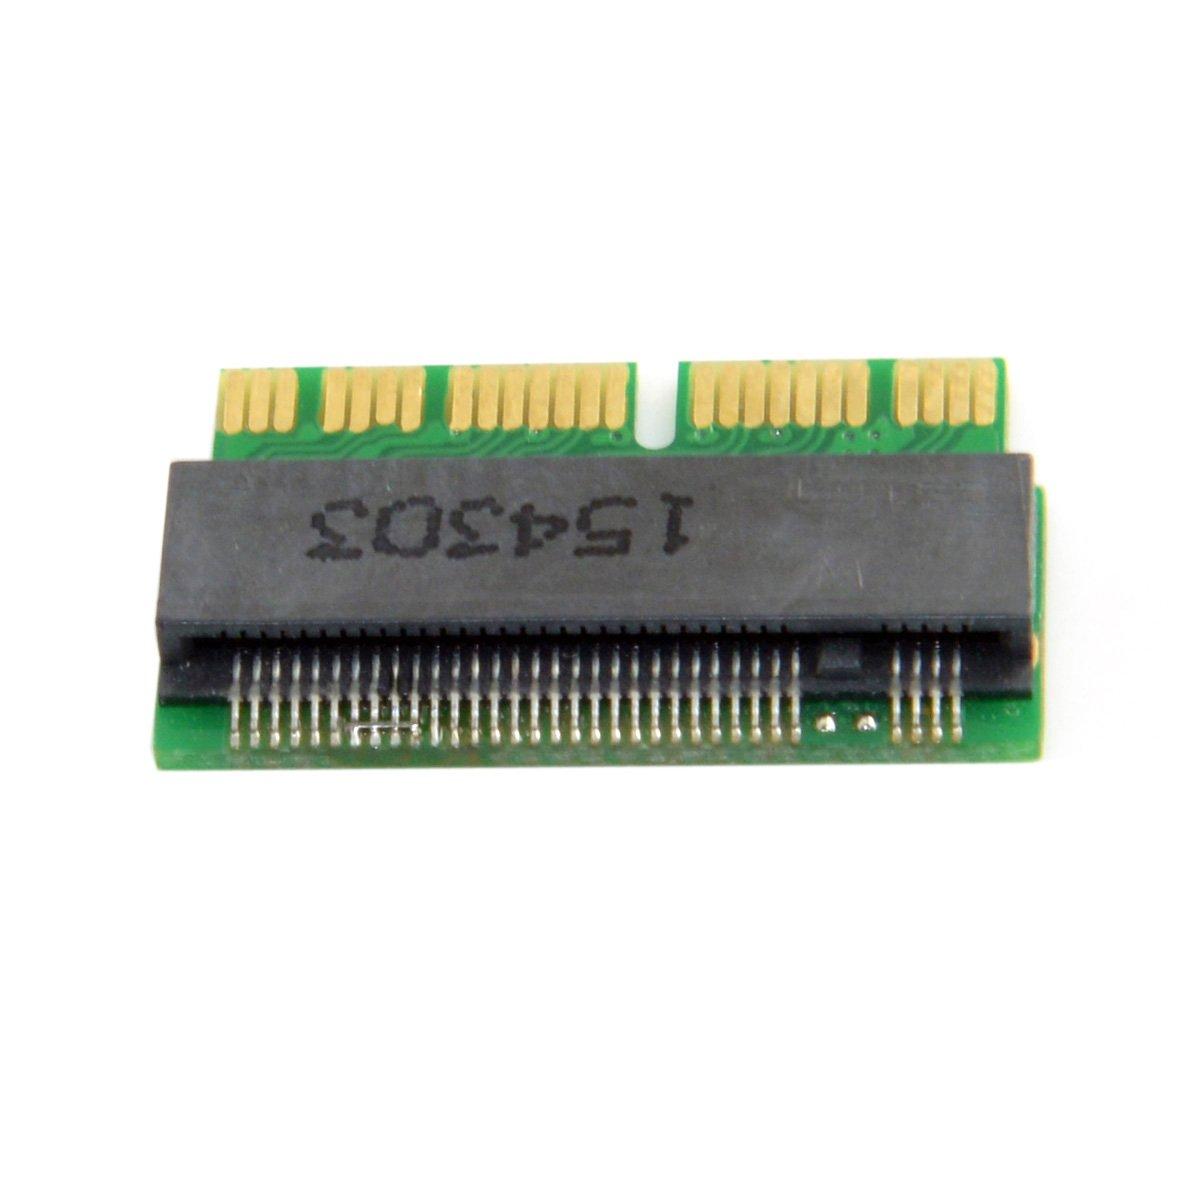 16pin auf M.2 NGFF M-Key AHCI SSD Konvertierungskarte f/ür A1493 A1502 A1465 A1466 CY 12